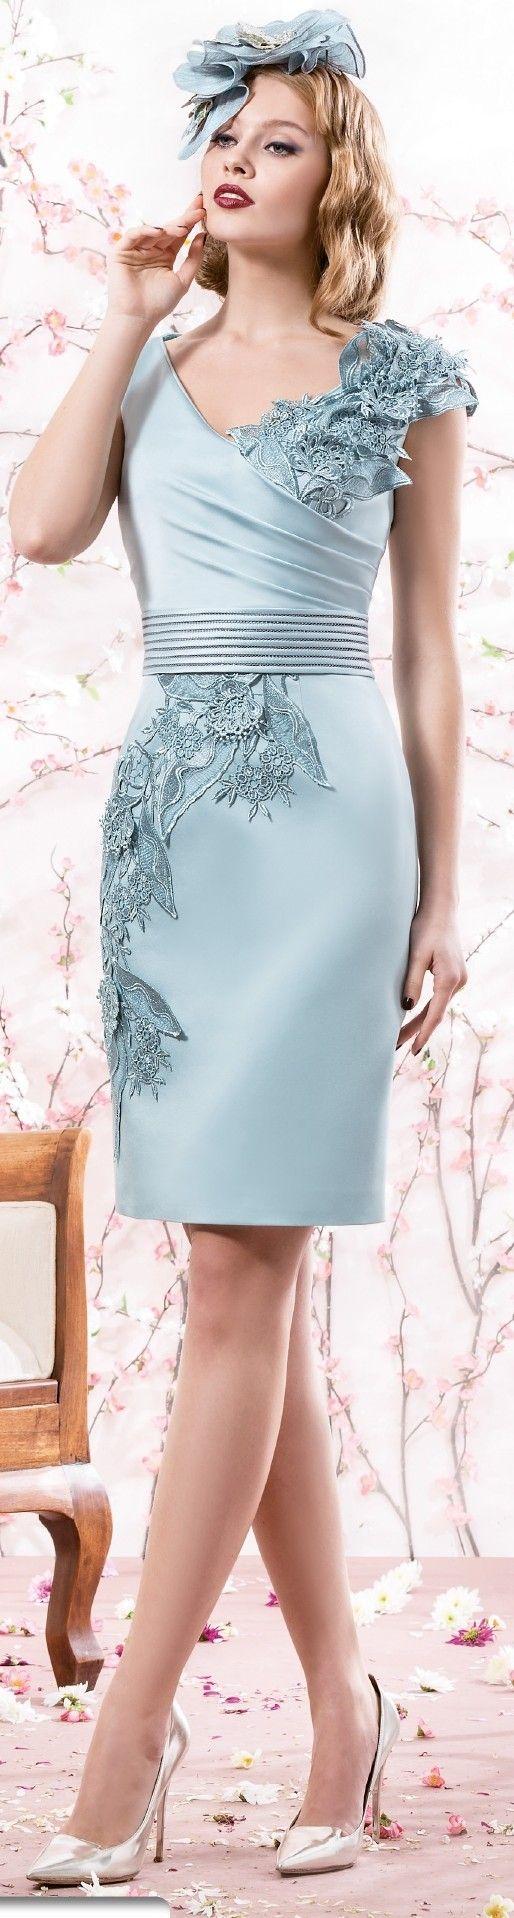 256 best images about Dresses on Pinterest